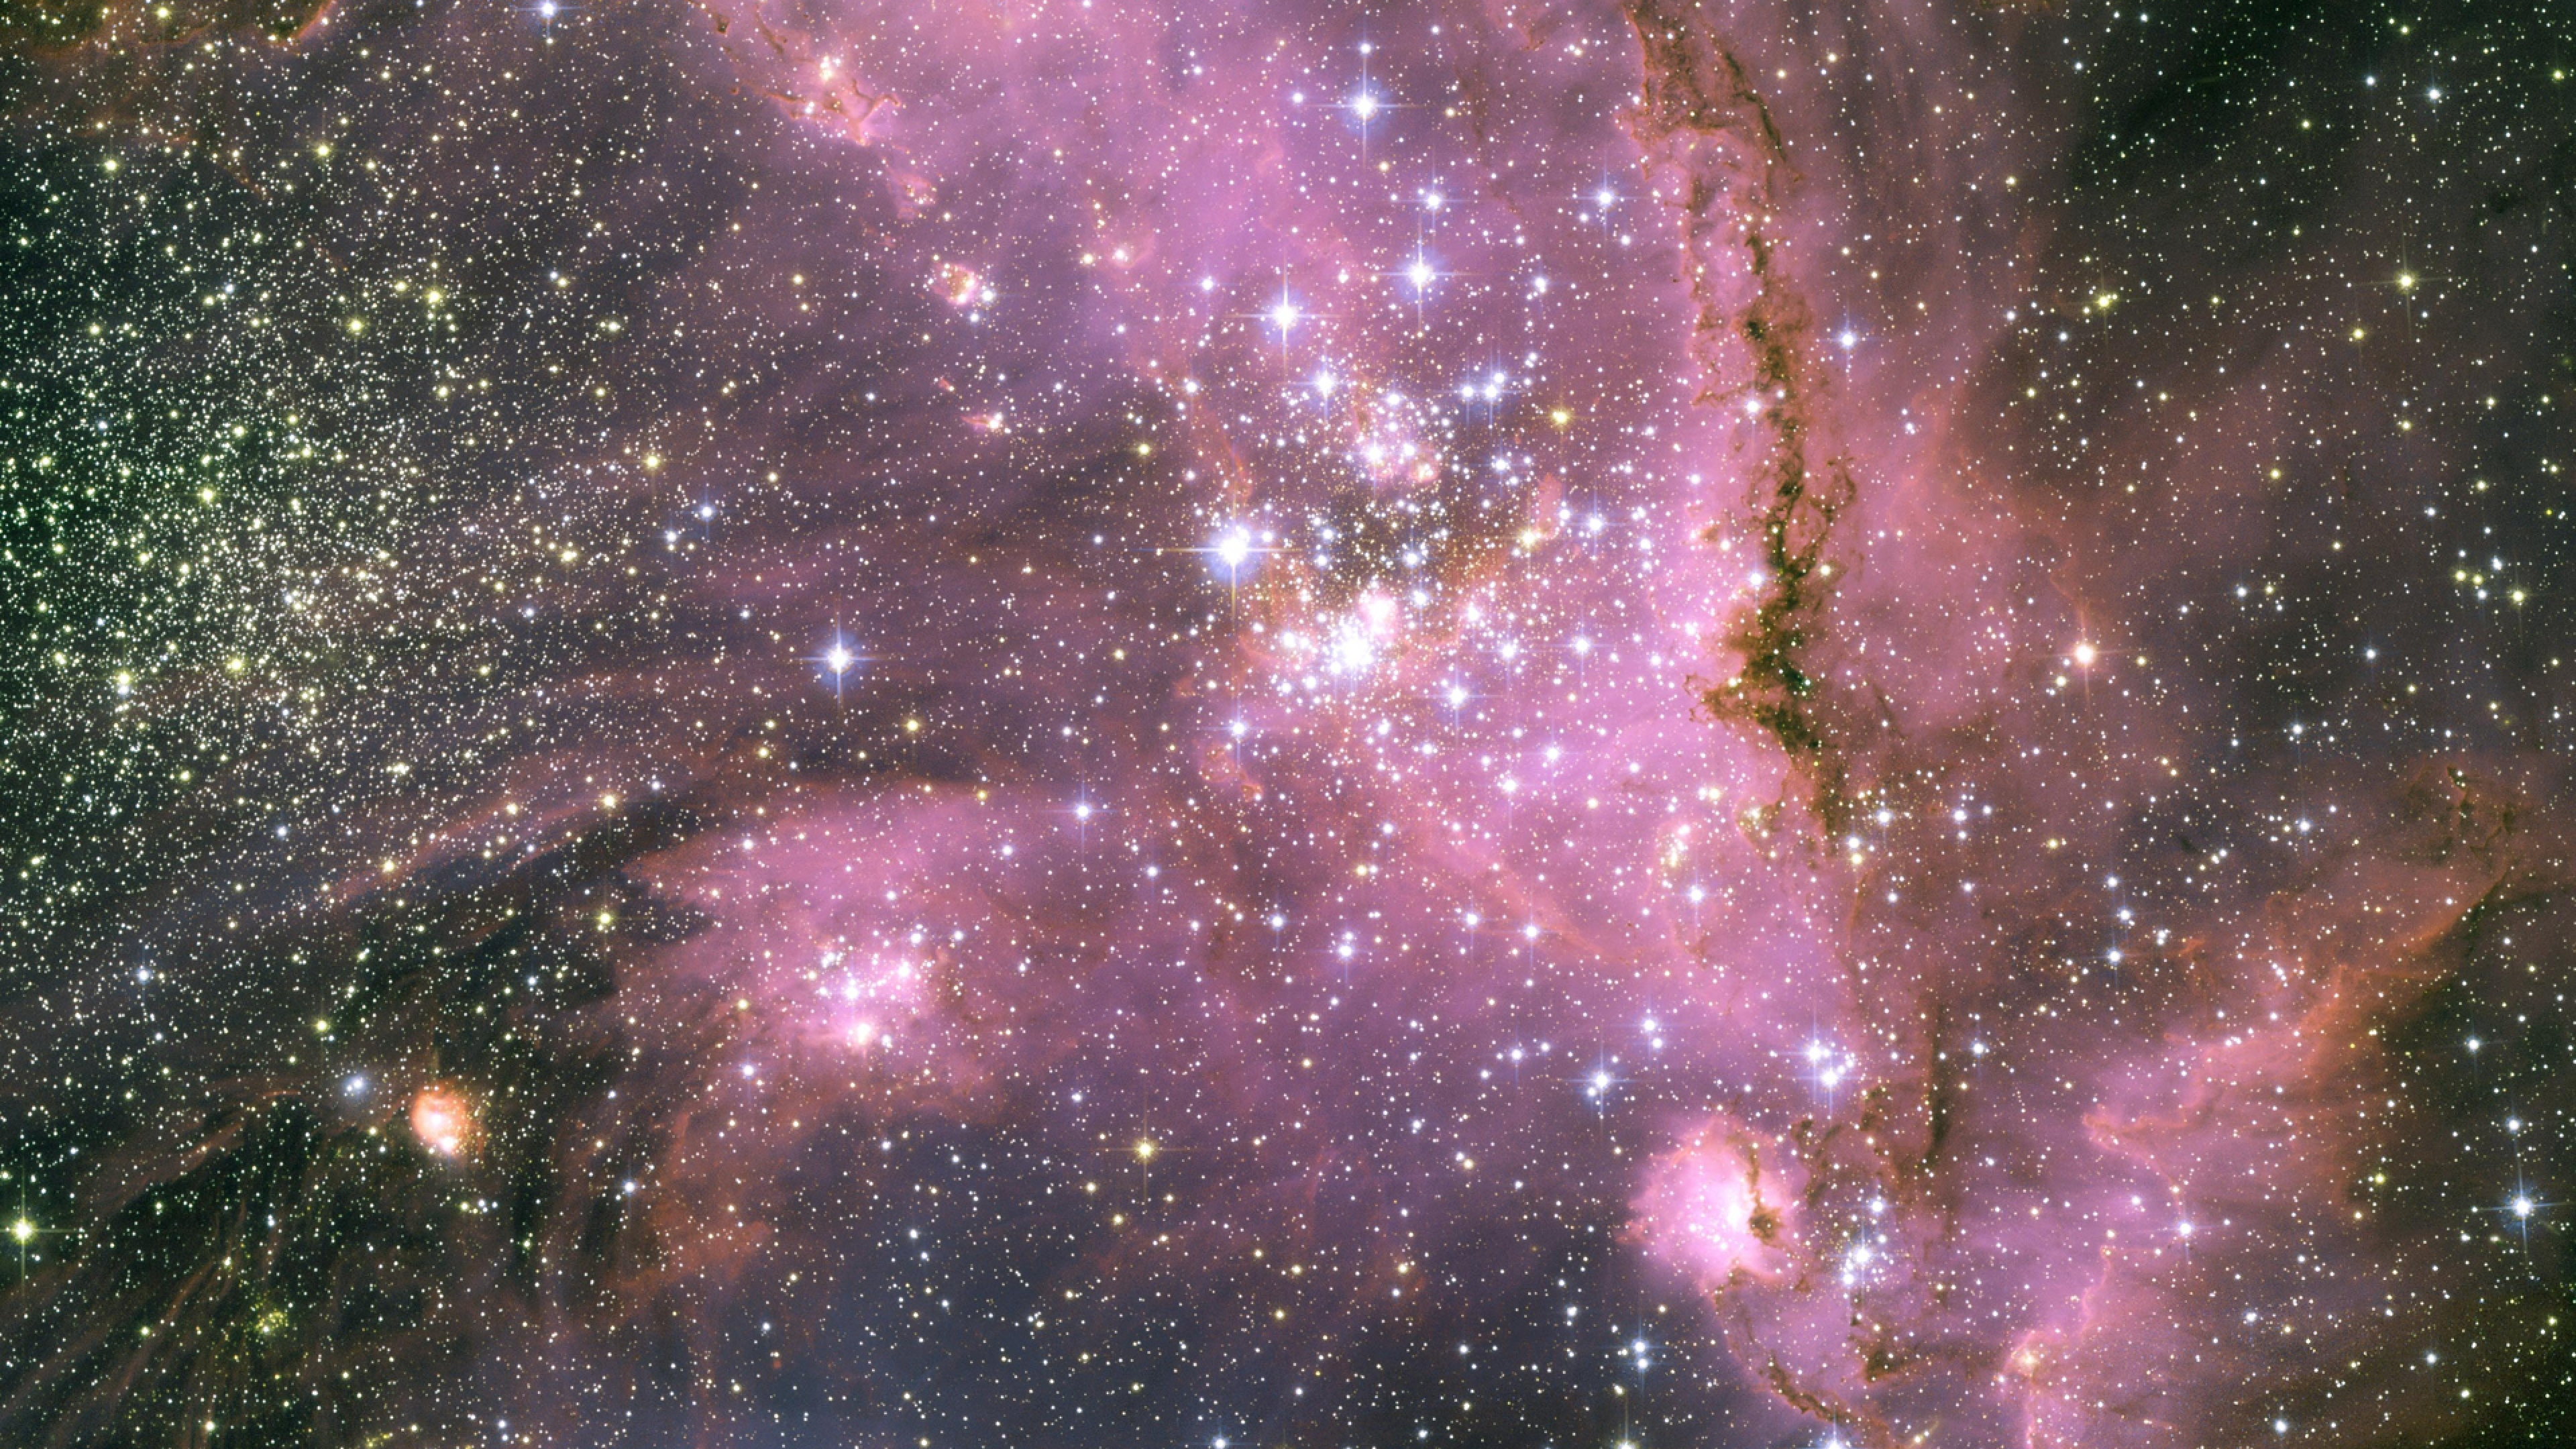 4k Galaxy Wallpaper Wallpapersafari